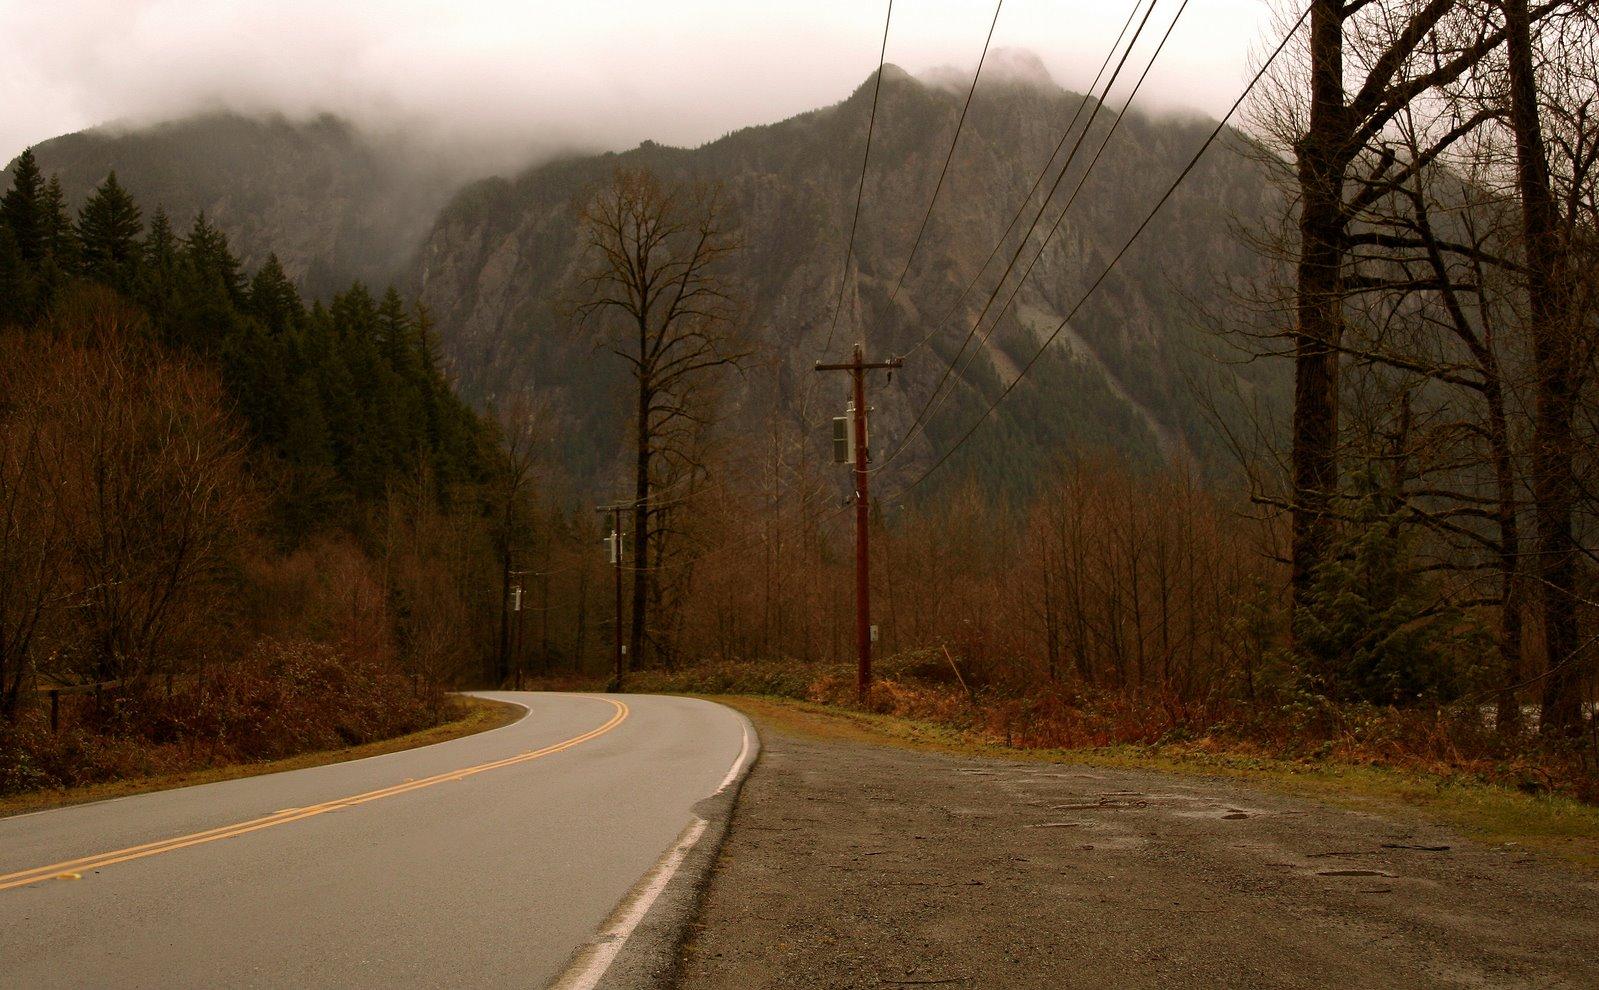 twin peaks melancholy